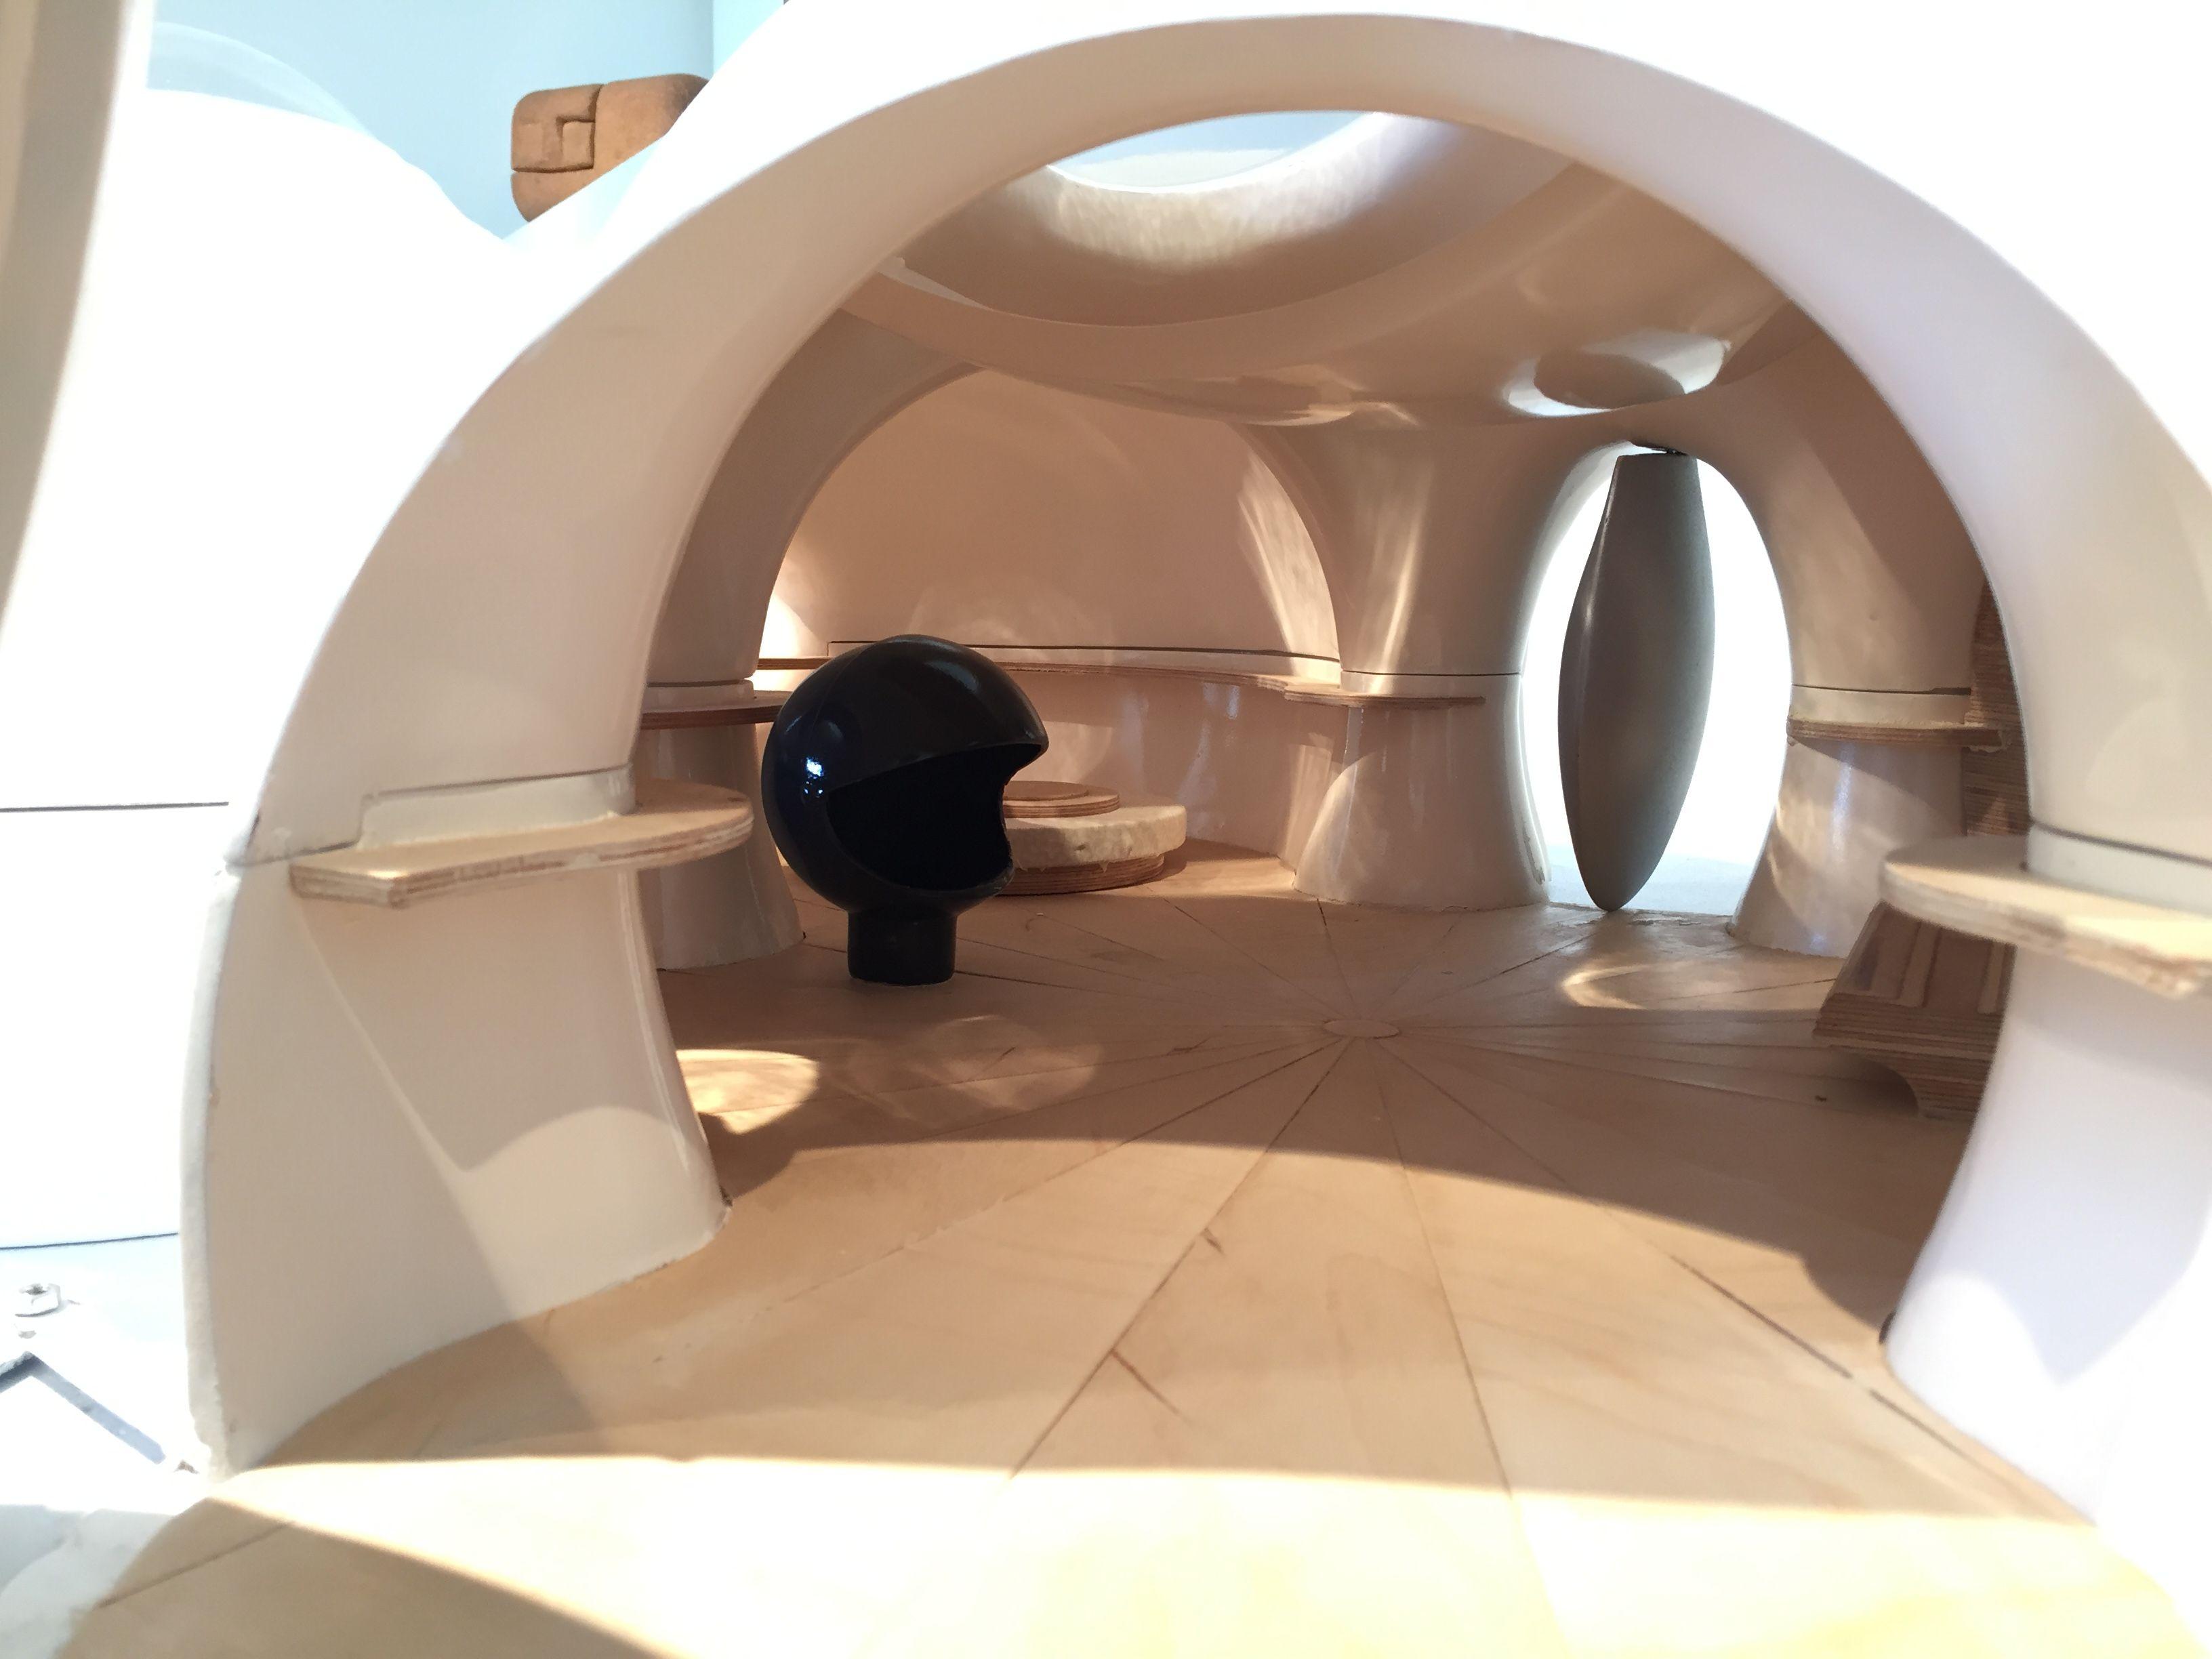 Antti lovag bubble house model inside model homes bubble house scale models bubbles